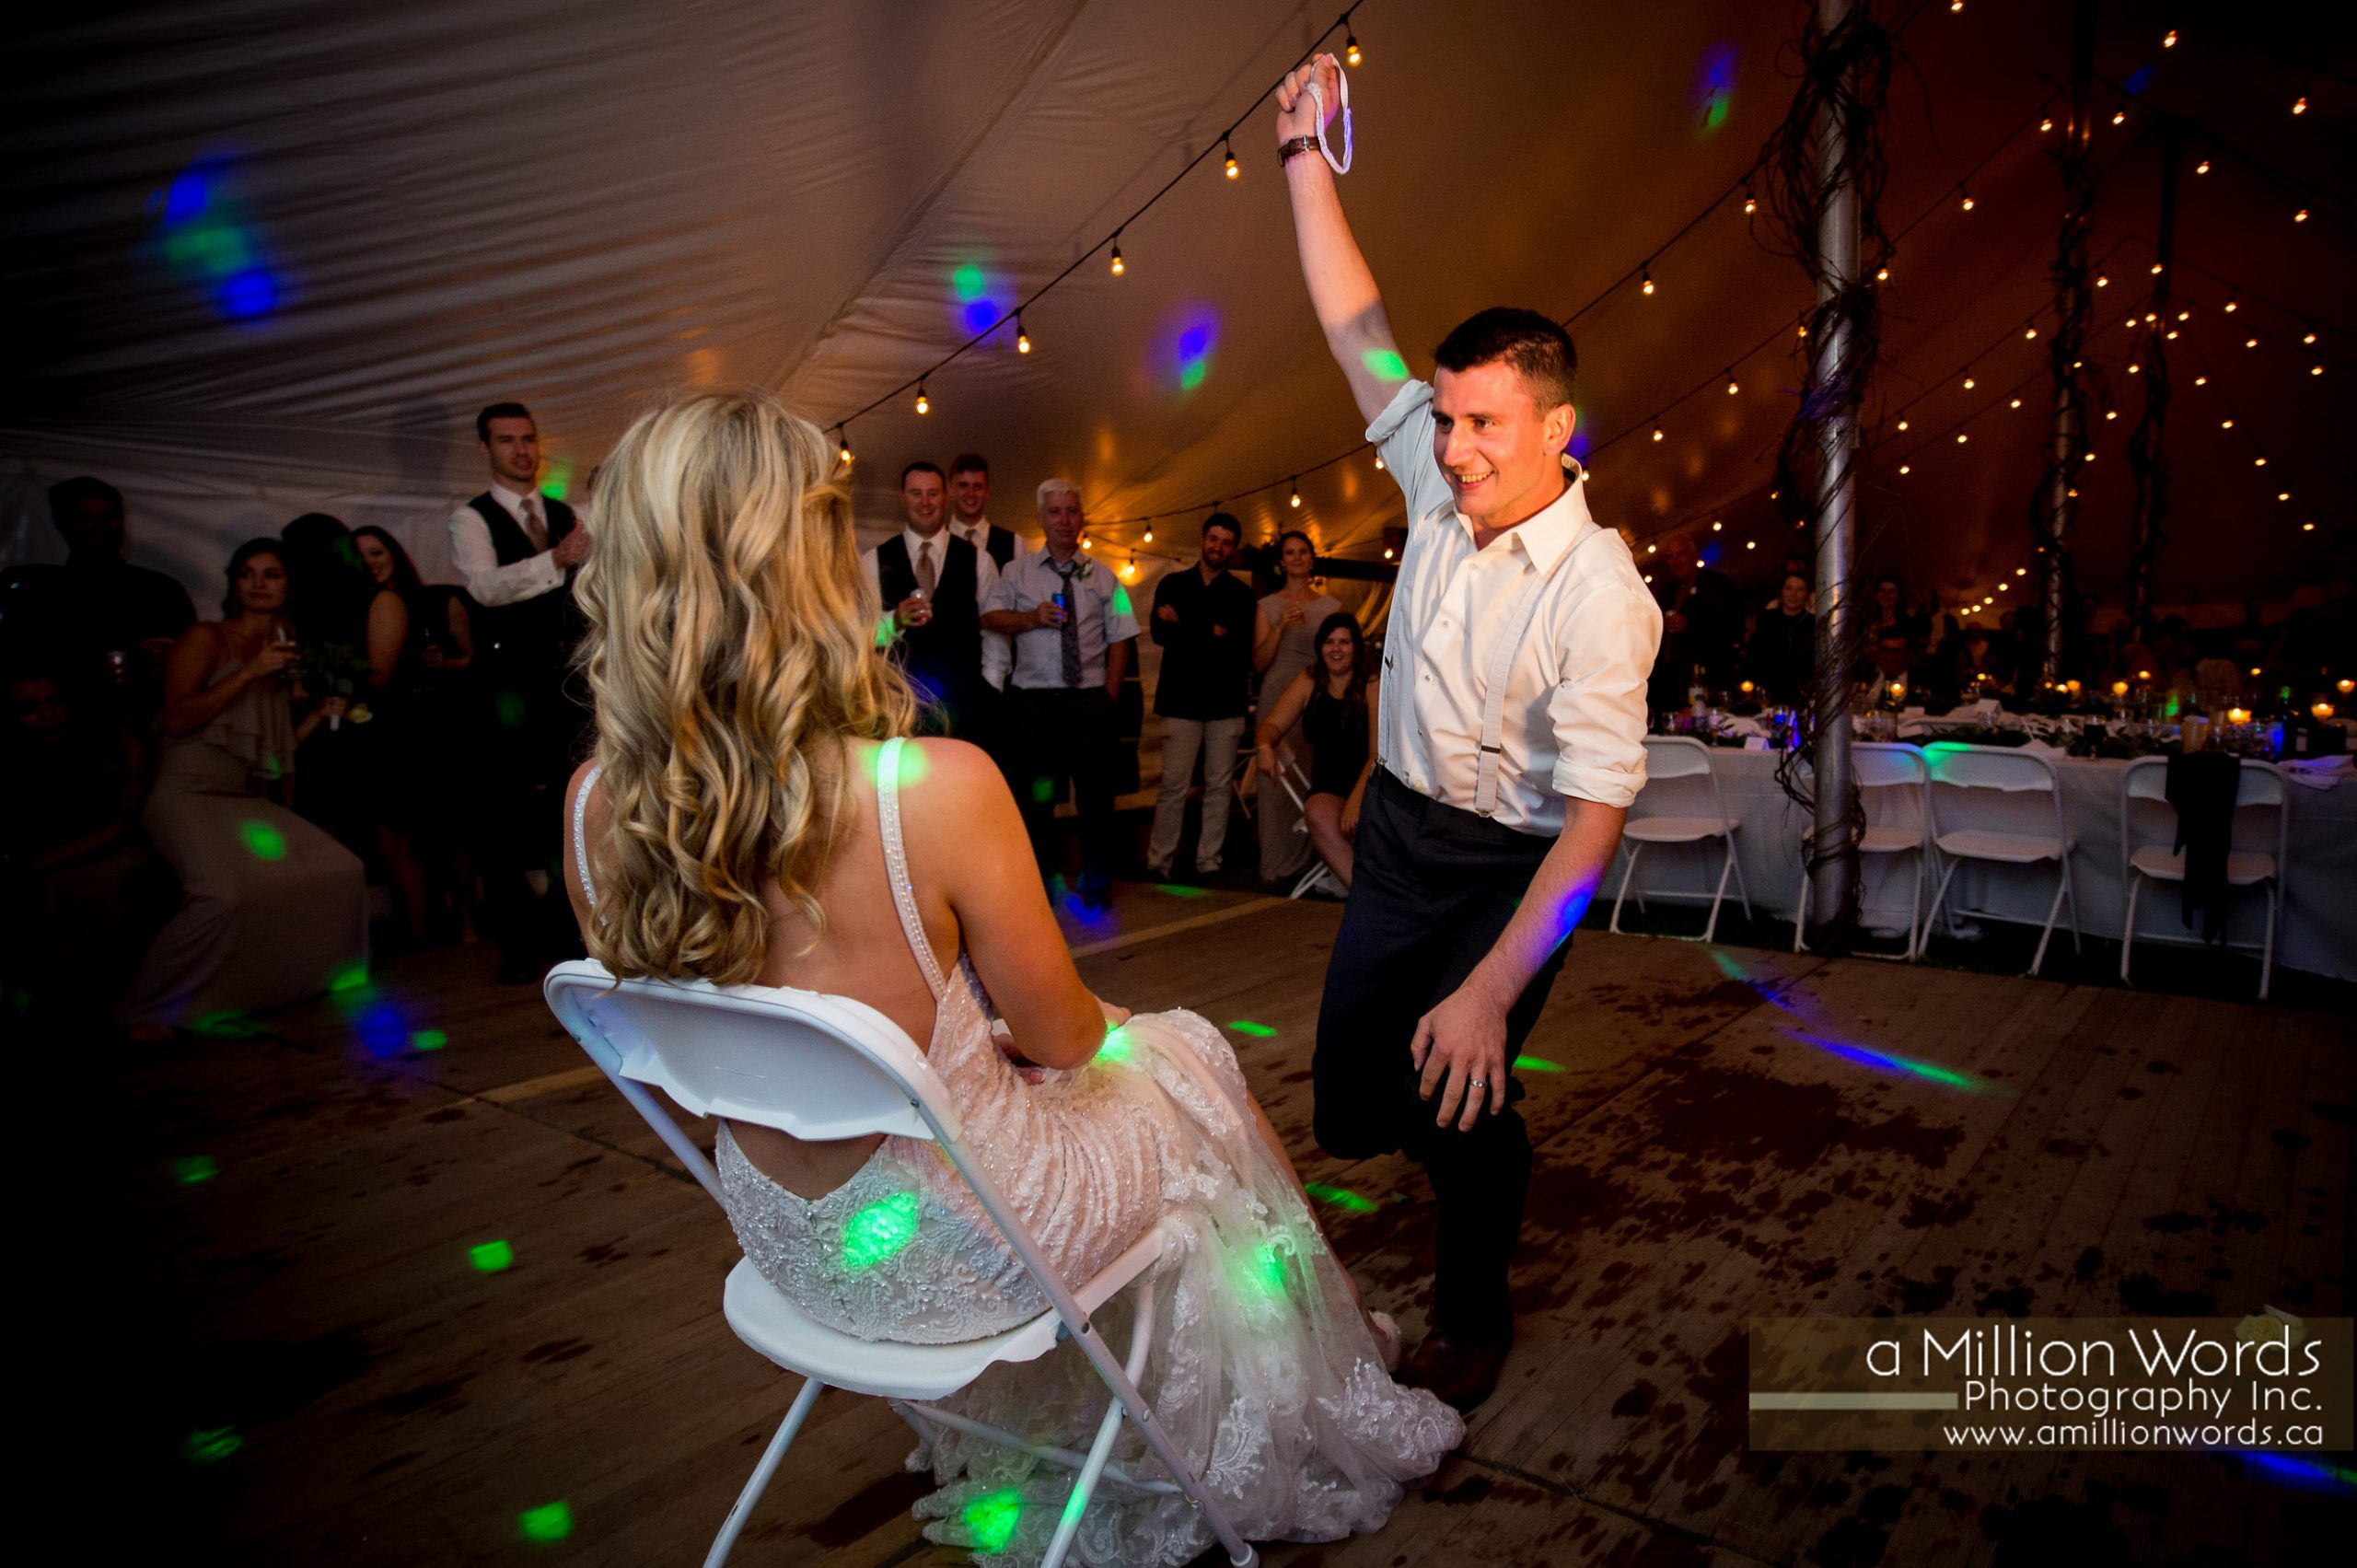 arthur_wedding_photographer86